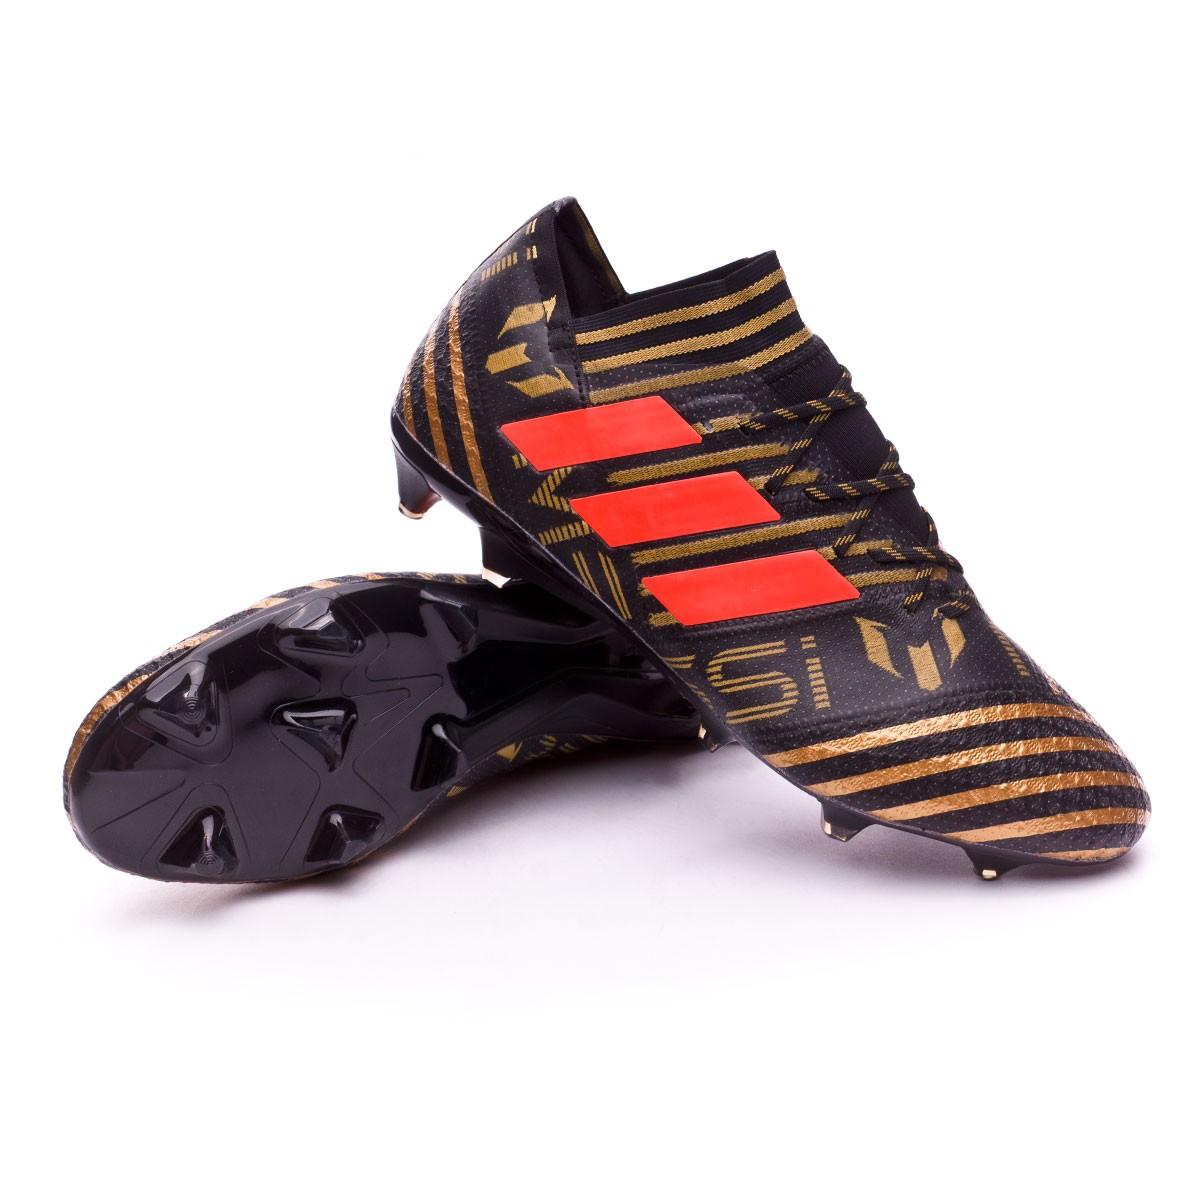 competitive price 19ada 6b668 Nemeziz Messi 17.1 FG Core black-Solar red-Tactile gold metallic